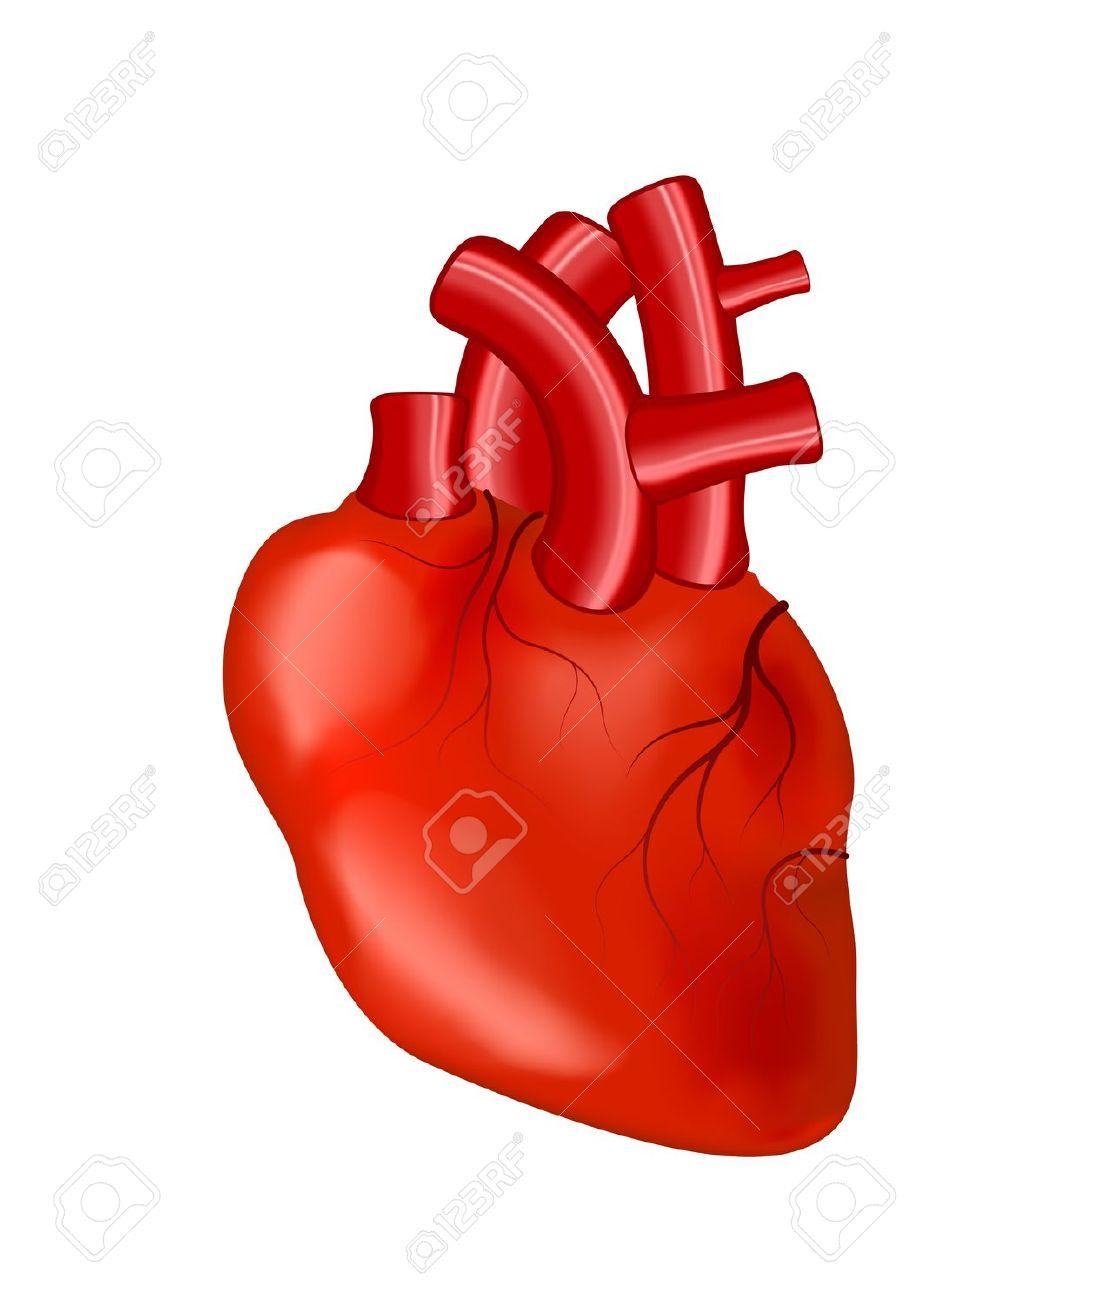 1093x1300 Stunning Design Ideas Real Heart Clipart Diagram Of Human Best